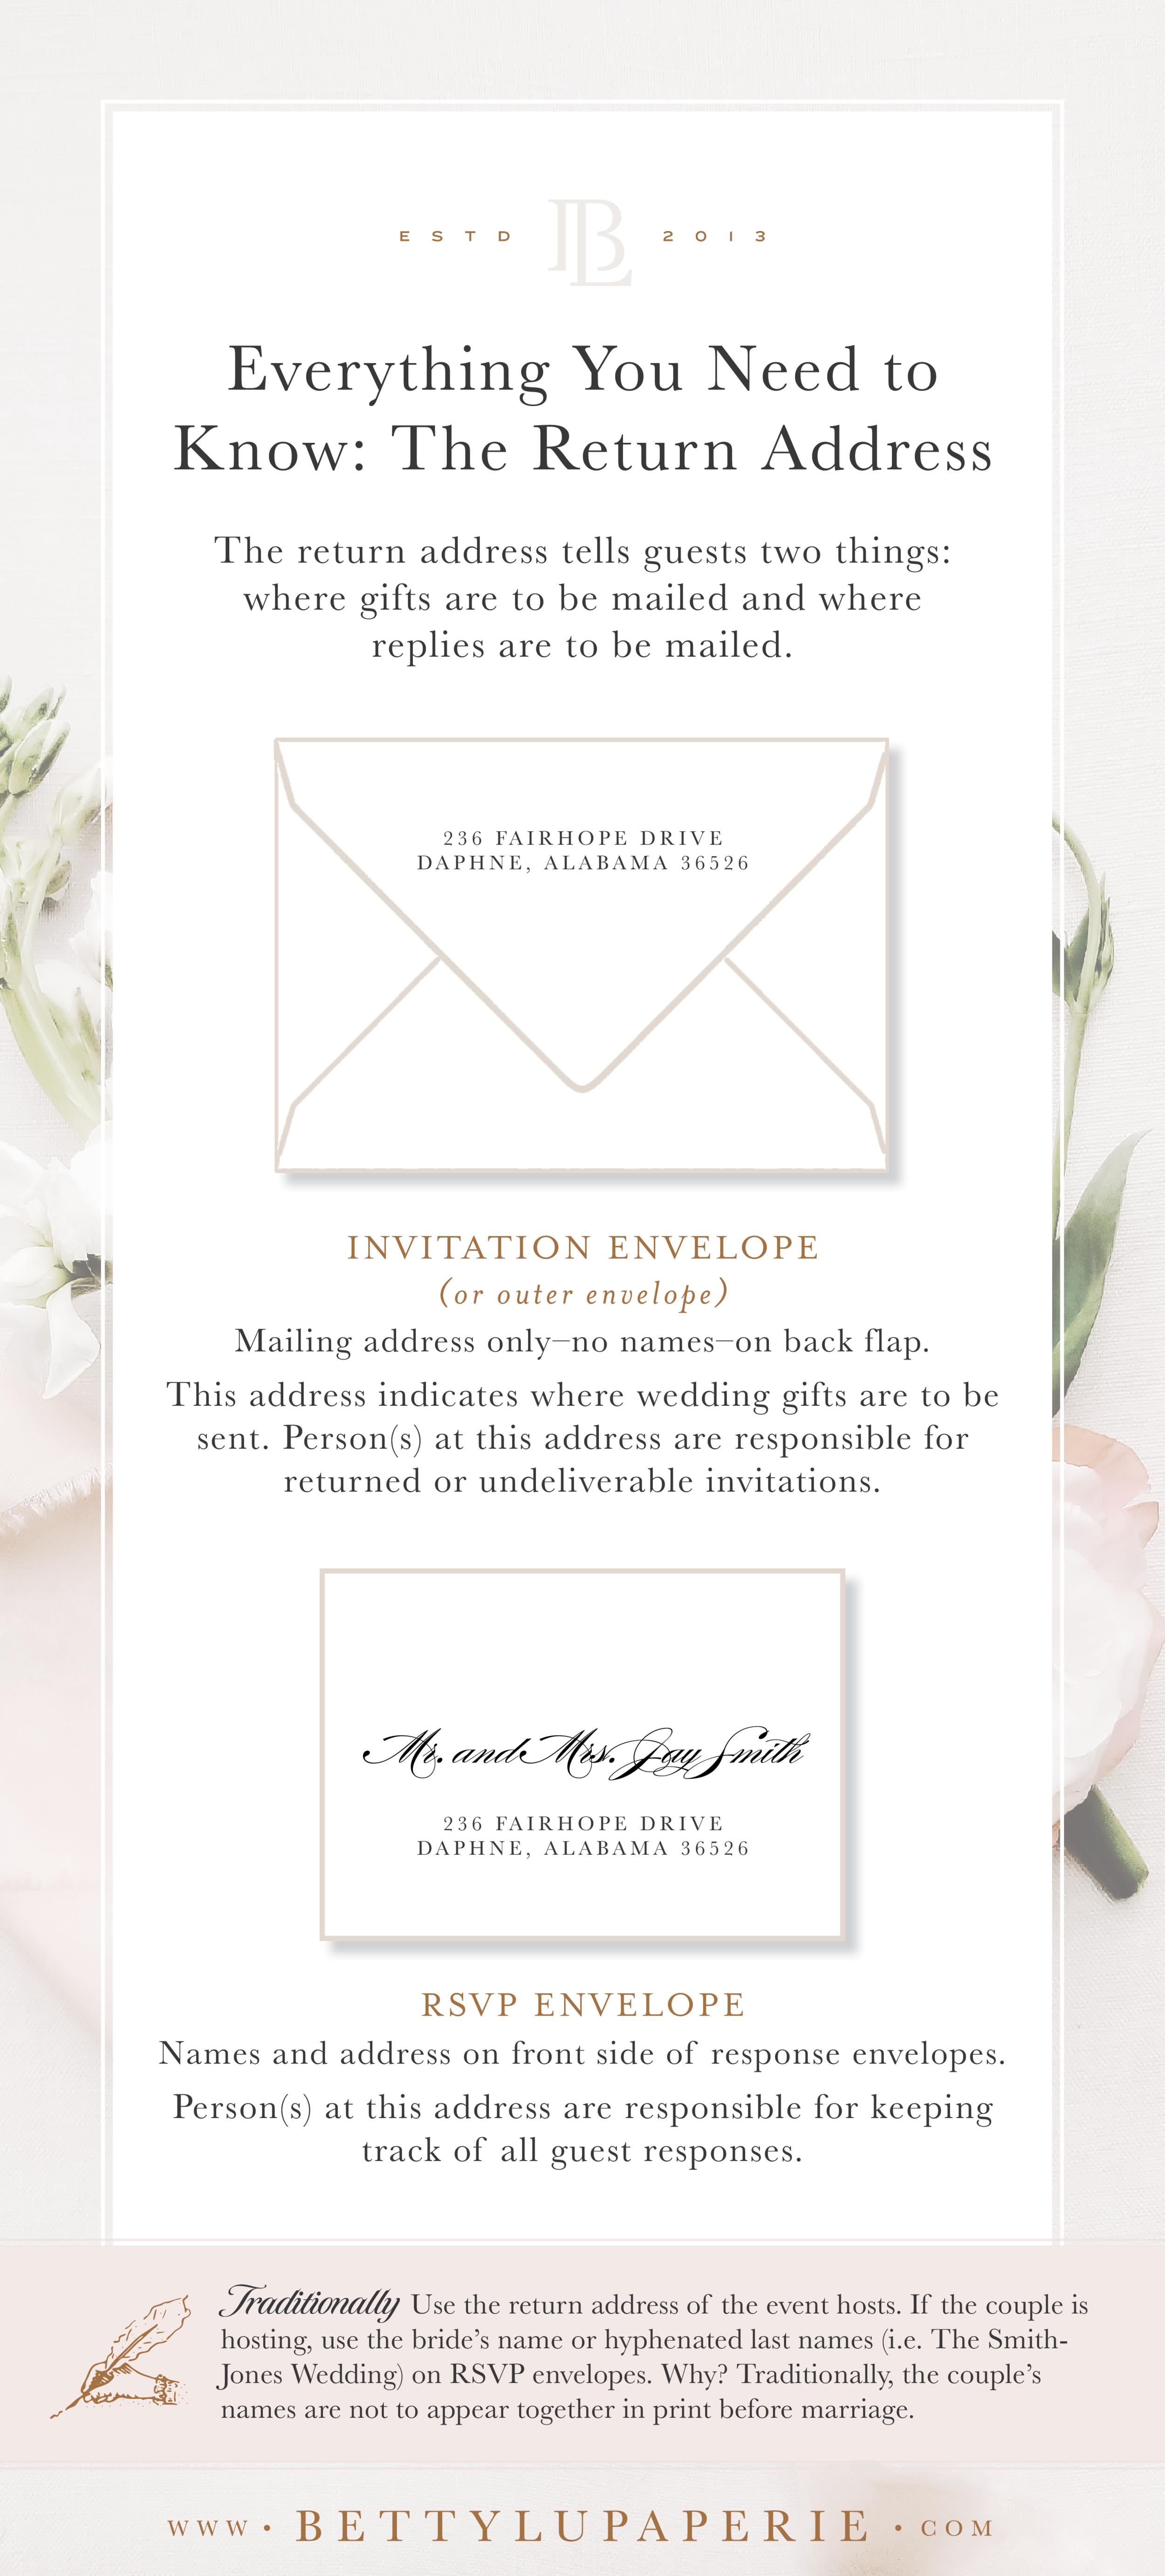 How To Address Wedding Invitations The Return Address Floral Wedding Invitations From Betty Lu Paperie